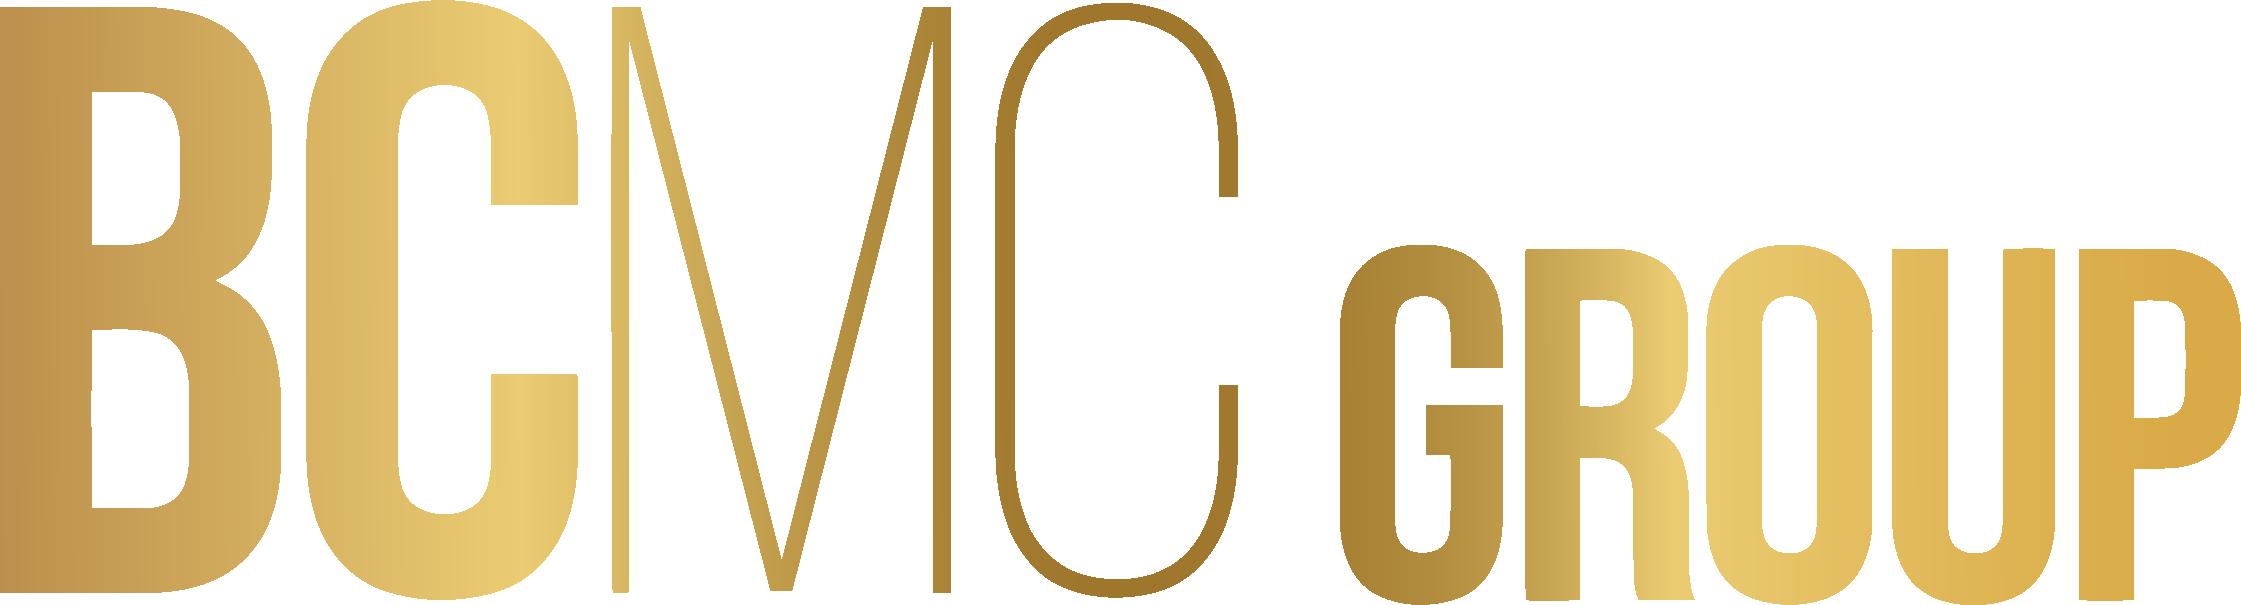 BCMC Group